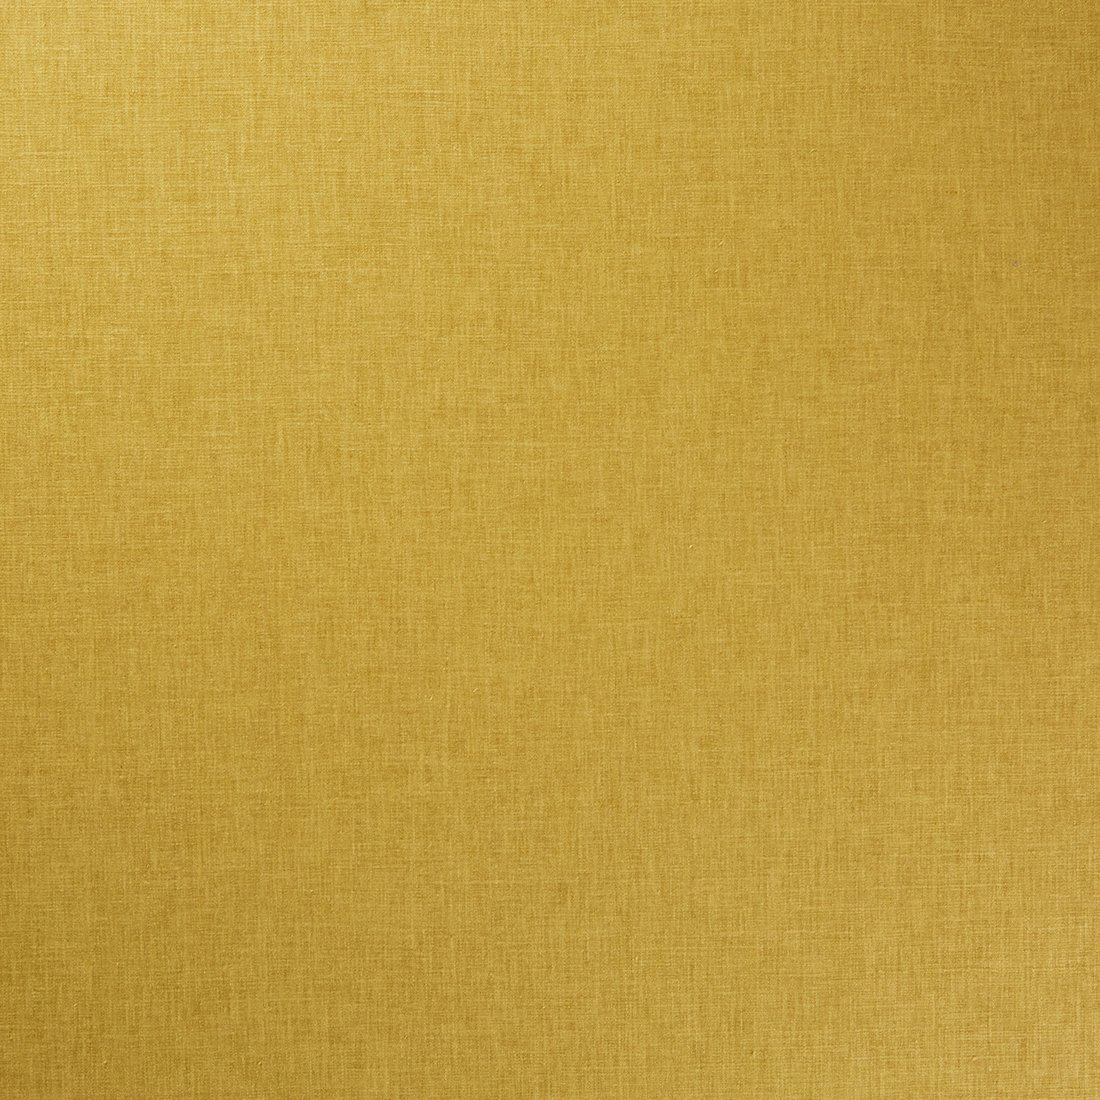 Iceland Citrine Upholstery Fabric